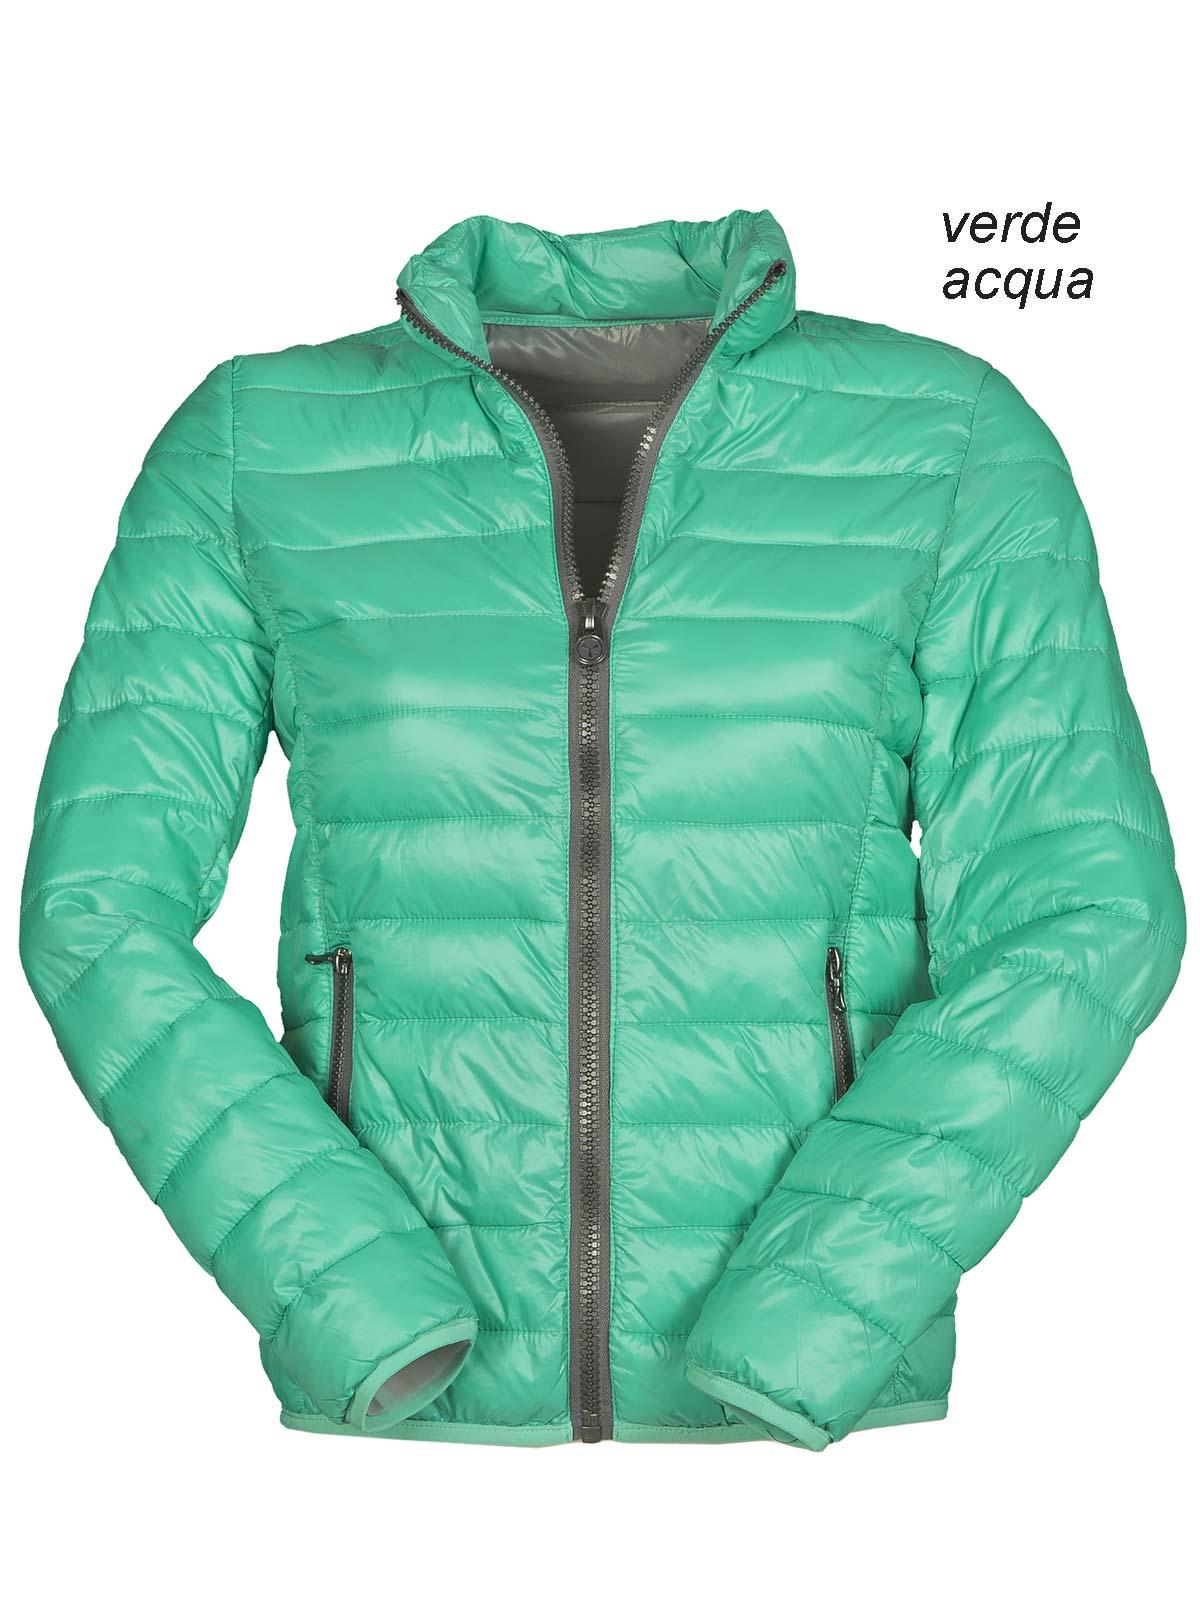 buy online a913b fae97 Piumino donna invernale Informal Lady Payper ...